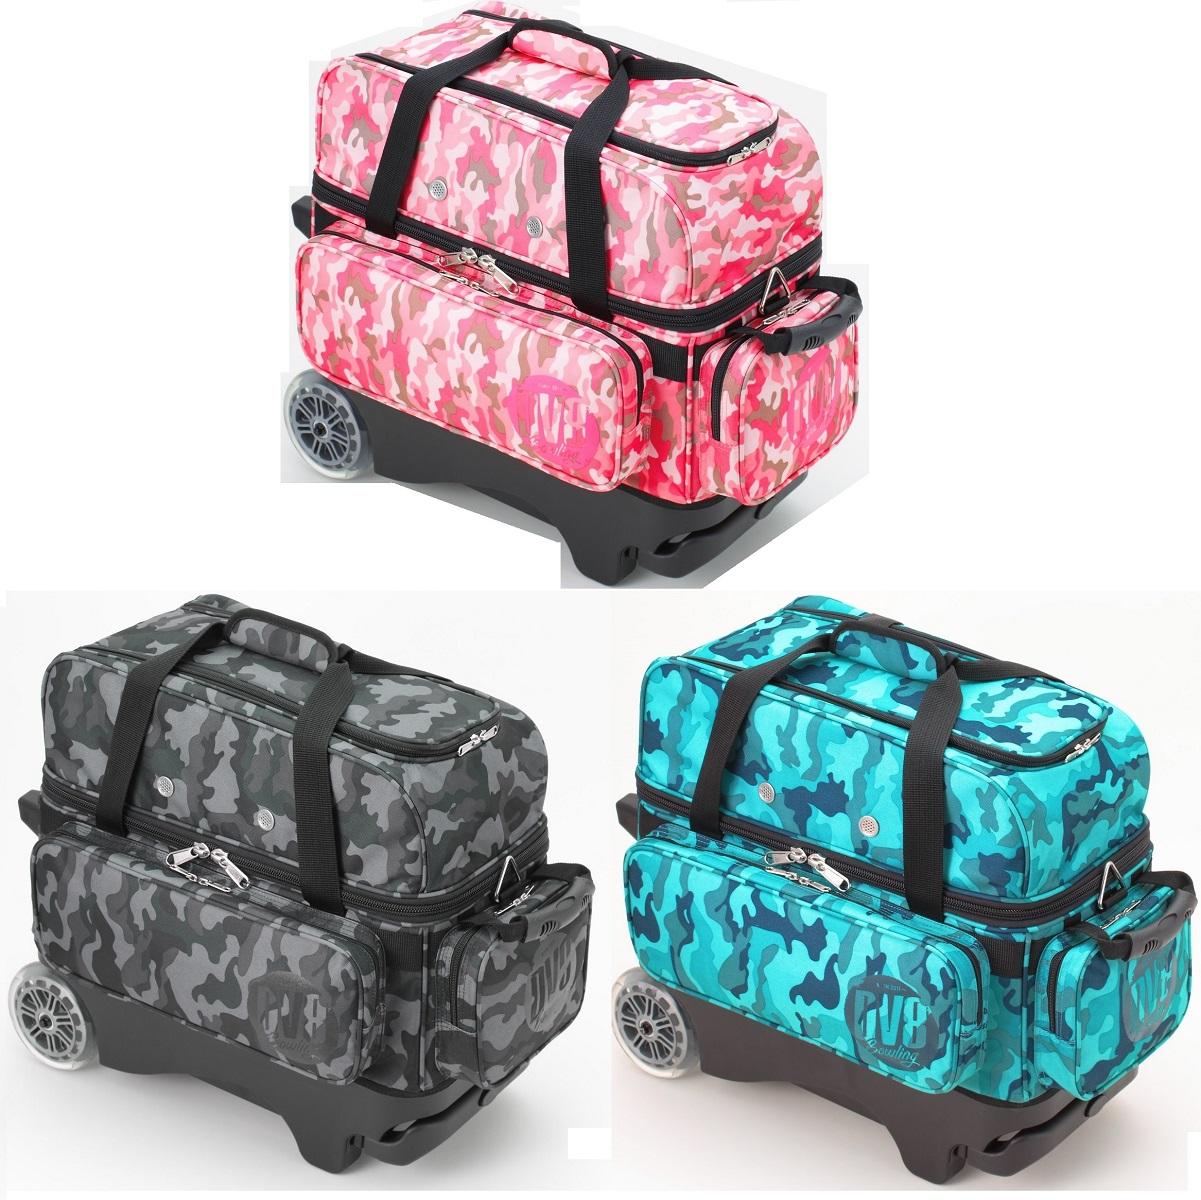 DV8 ボウリング バッグ 迷彩柄・ダブルローラー キャスター カート バッグ  全3色 【ボウリング用品】